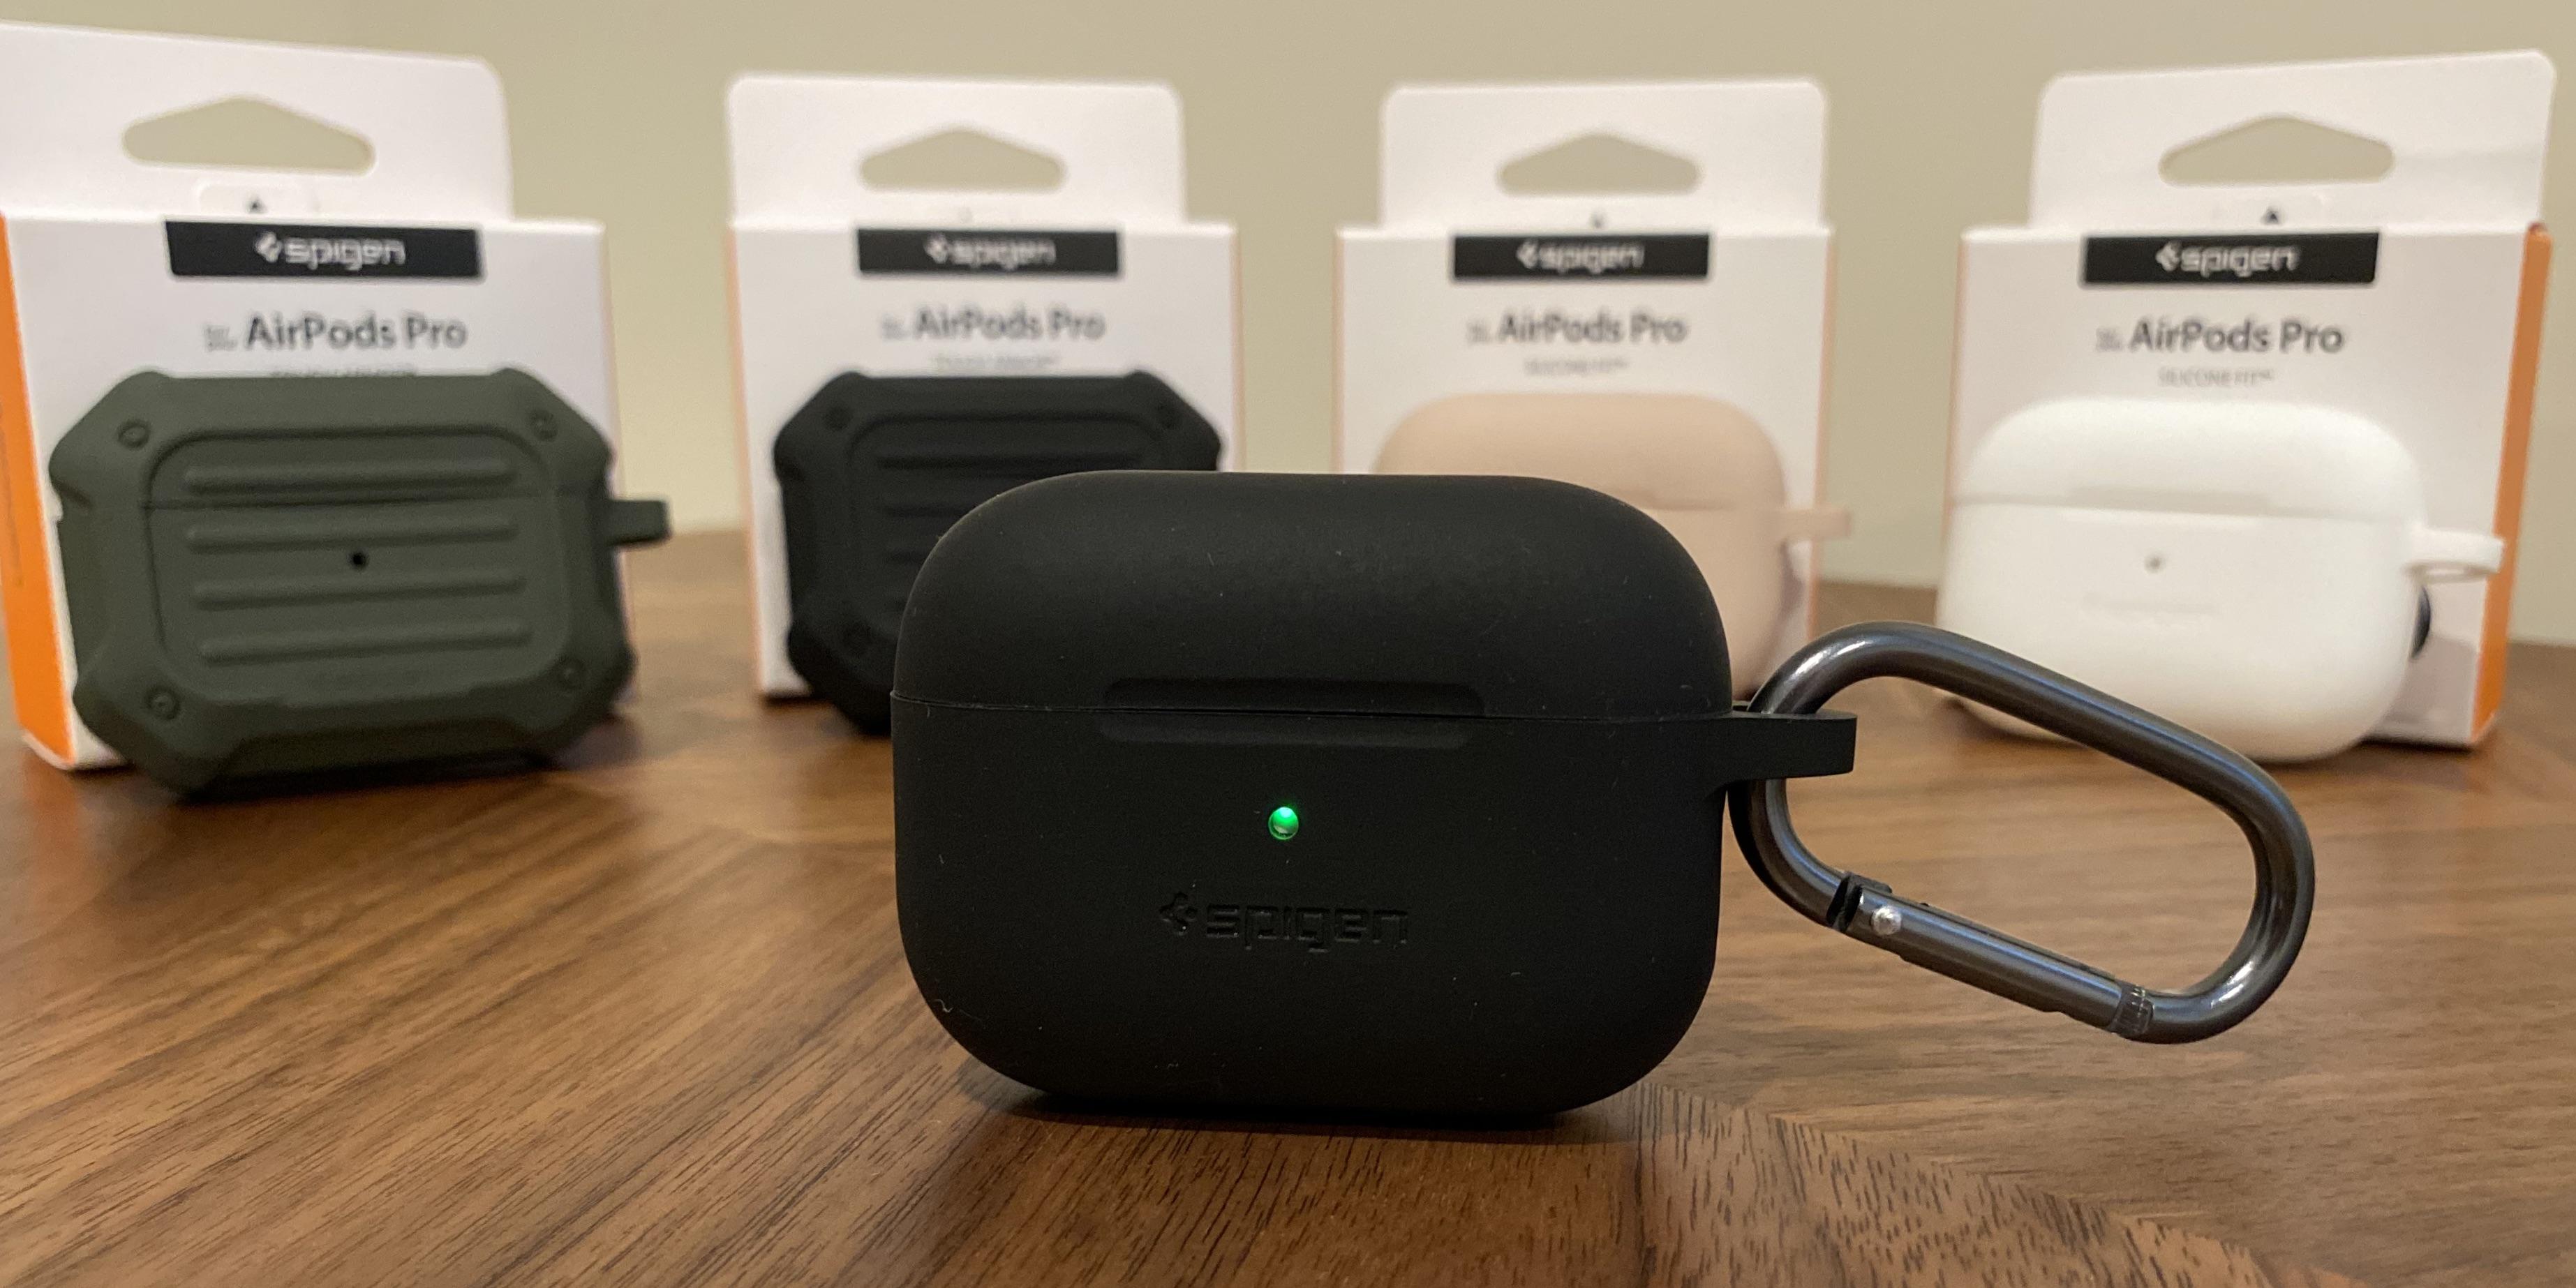 Review Spigen S Airpods Pro Cases Offer Grip Protection Color